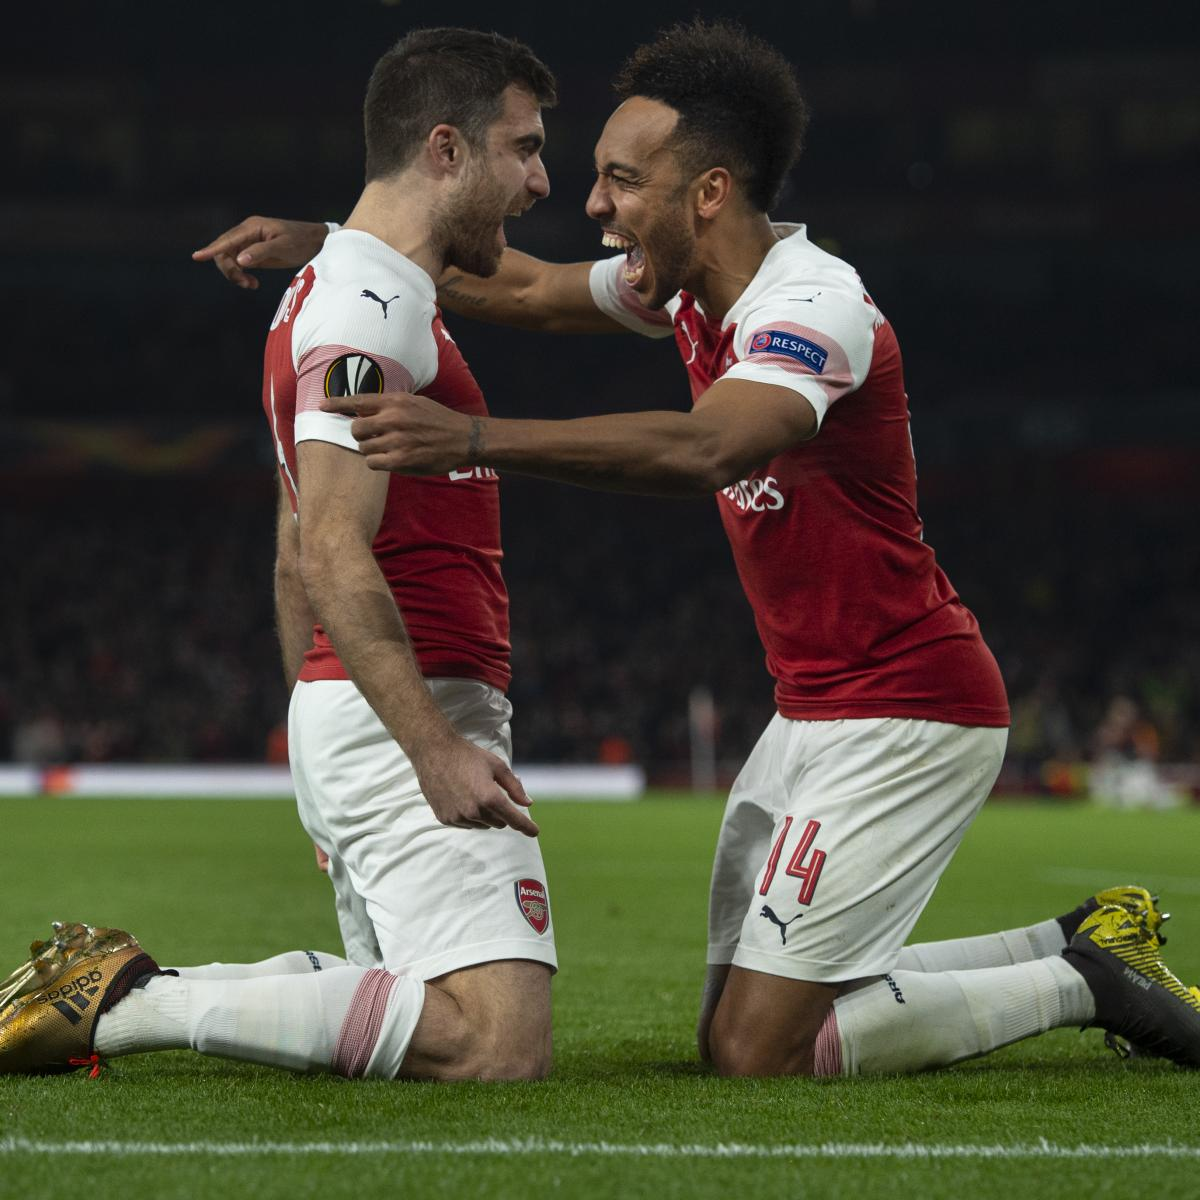 Champions League 2019 Round Of 16 Leg 2 Live Stream Tv: Rennes Vs. Arsenal: Odds, Preview, Live Stream, TV Info